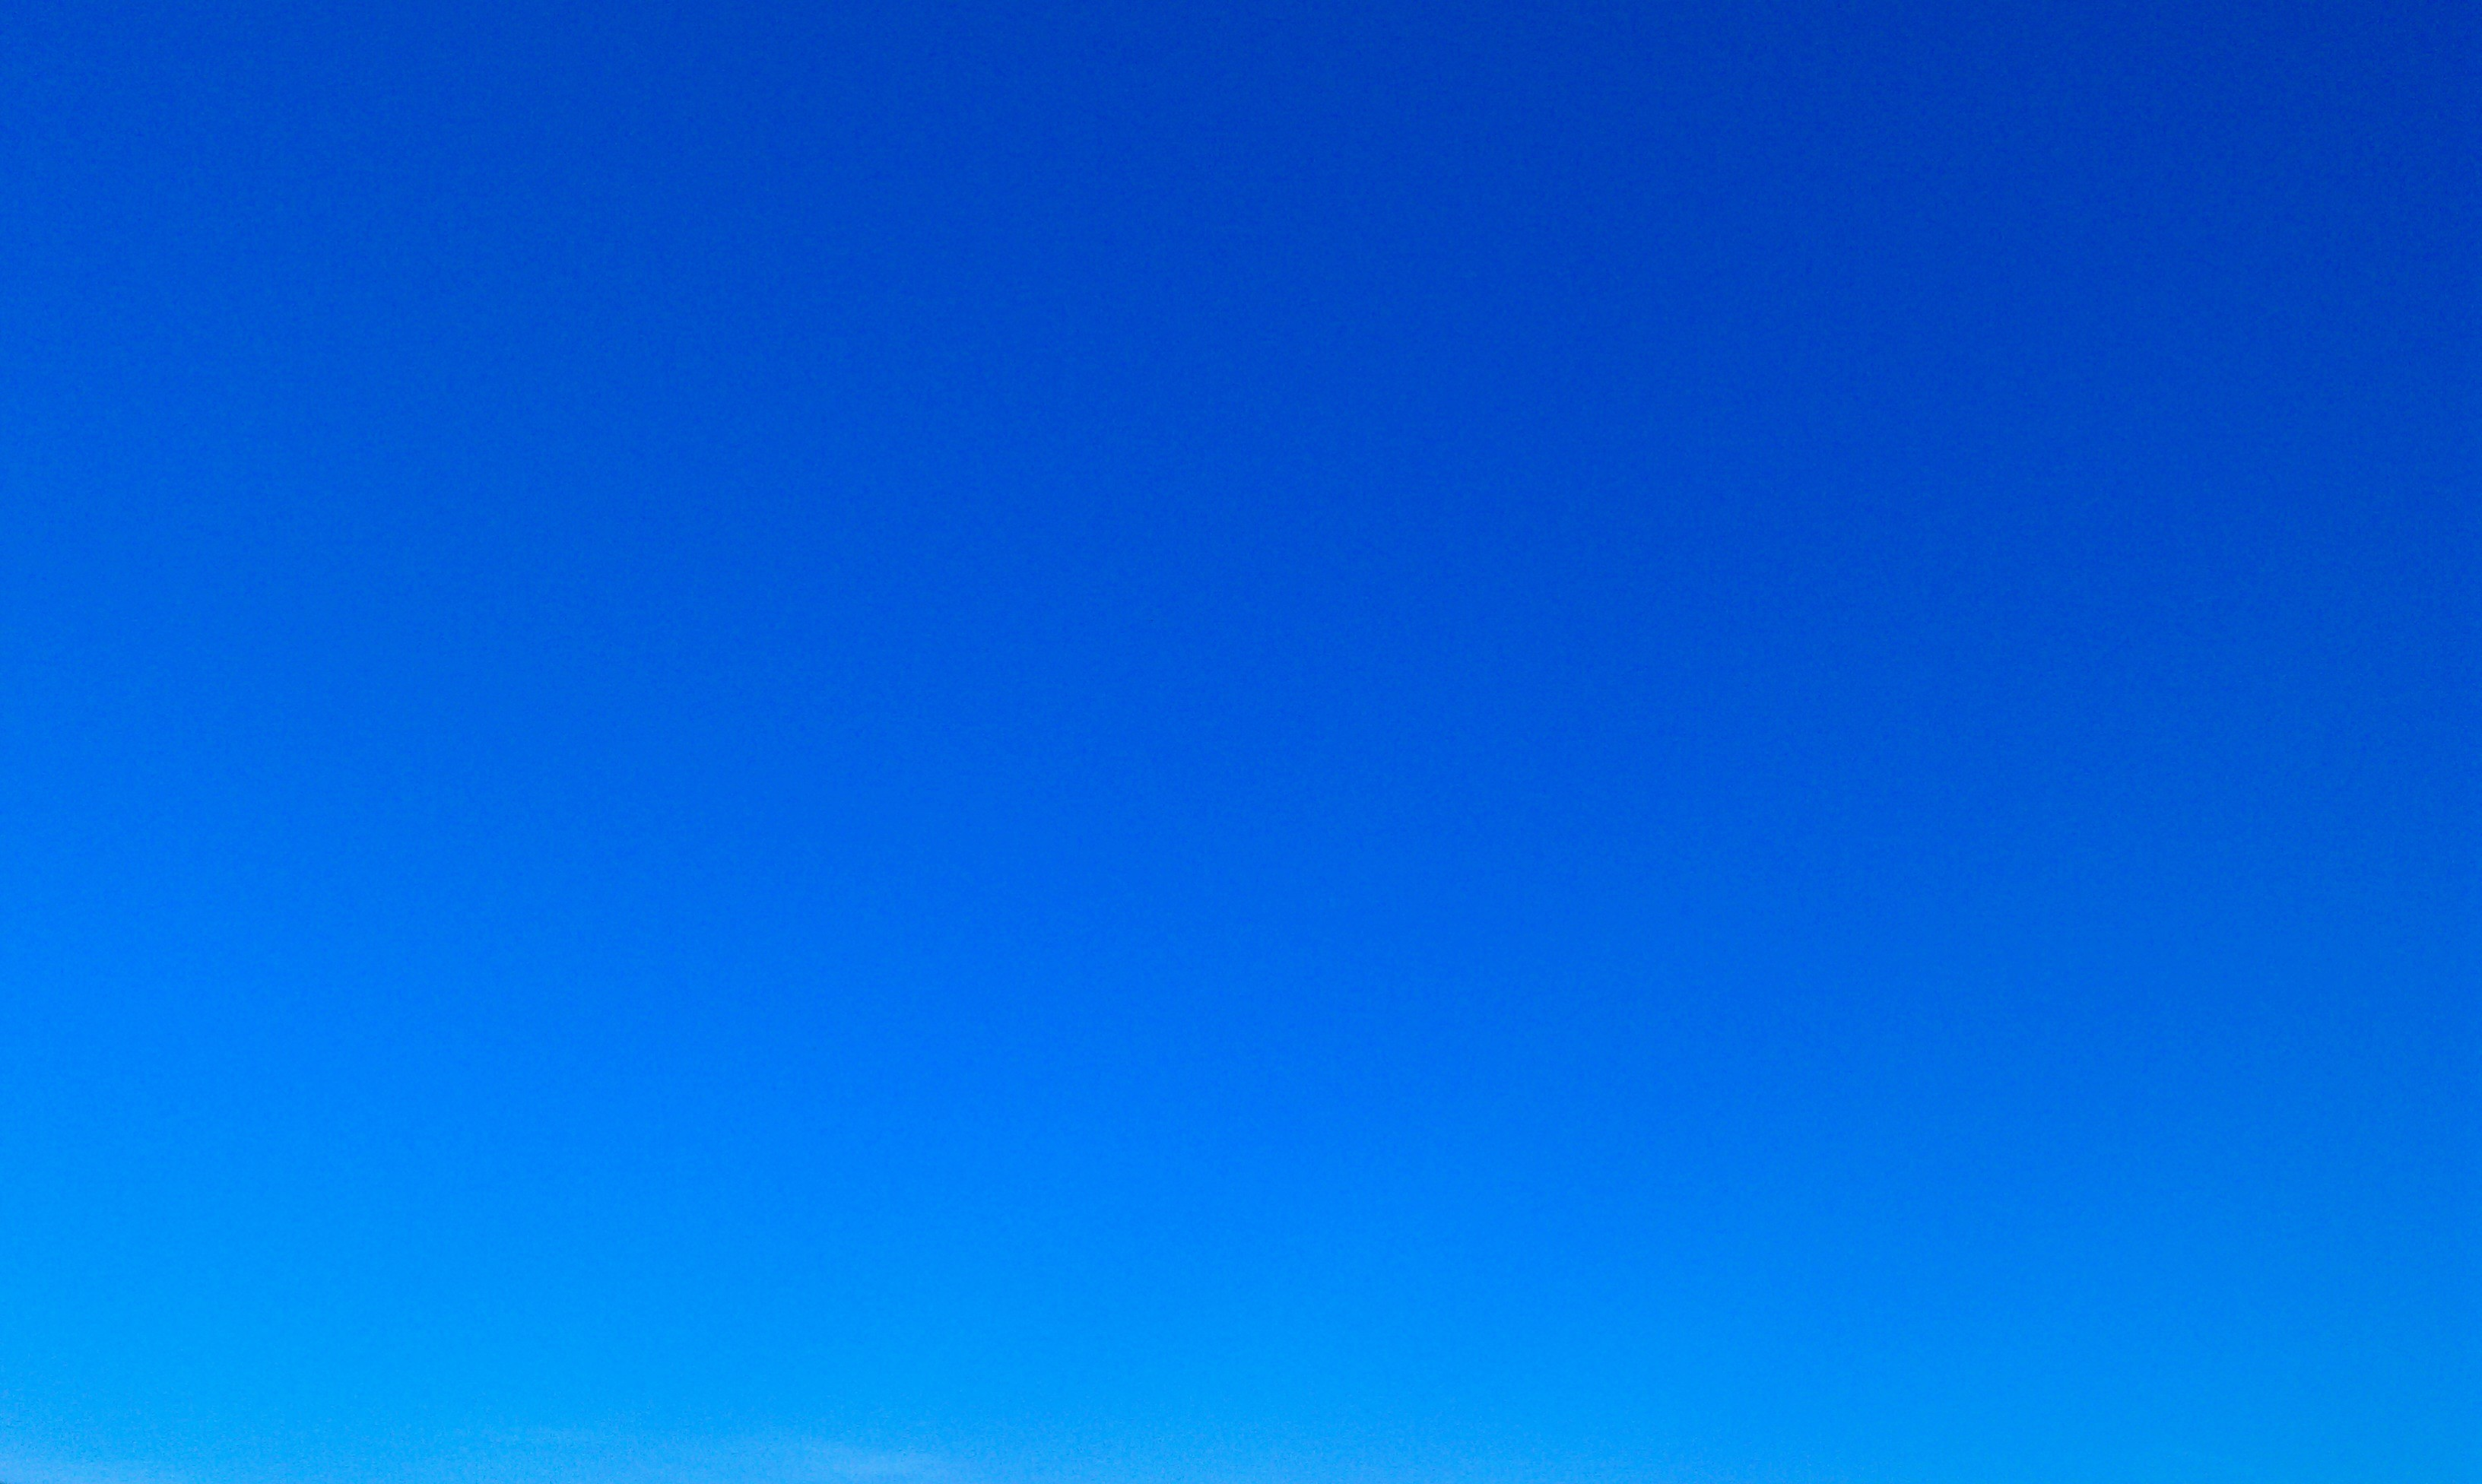 259-2596682_3264x1952-blue-sky-wallpapers-hd-data-id-167407.jpg